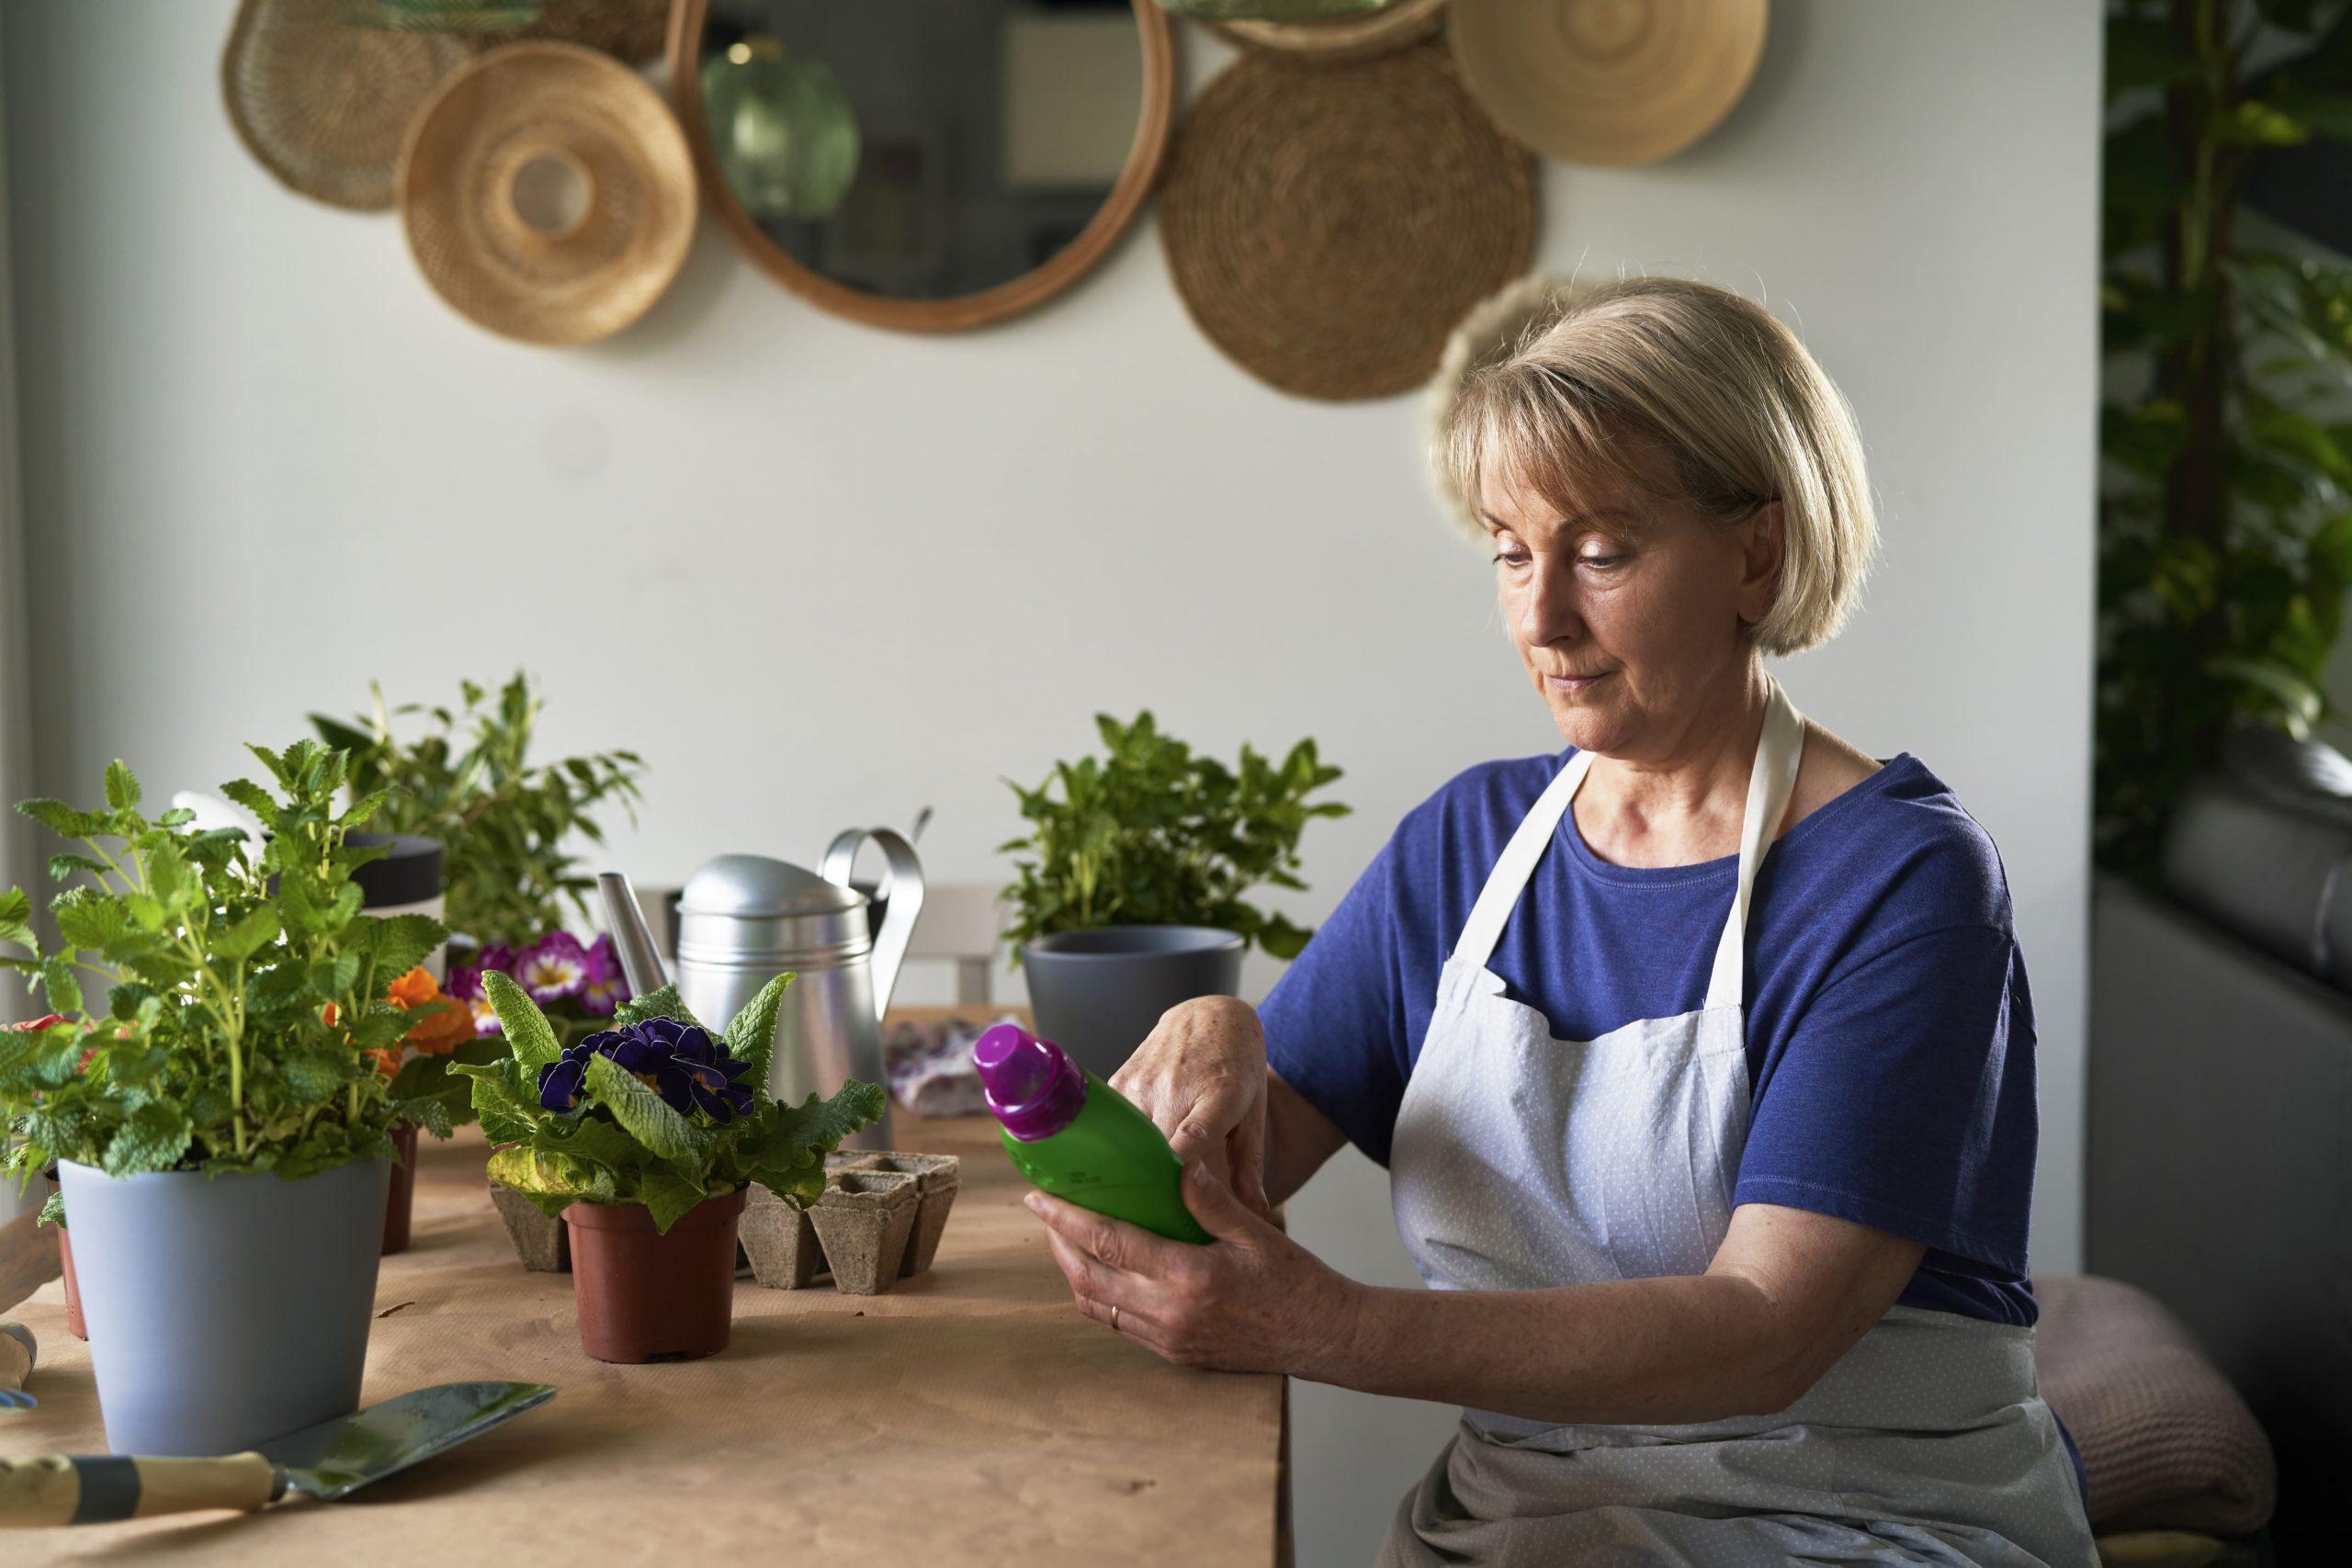 woman-using-fertilizer